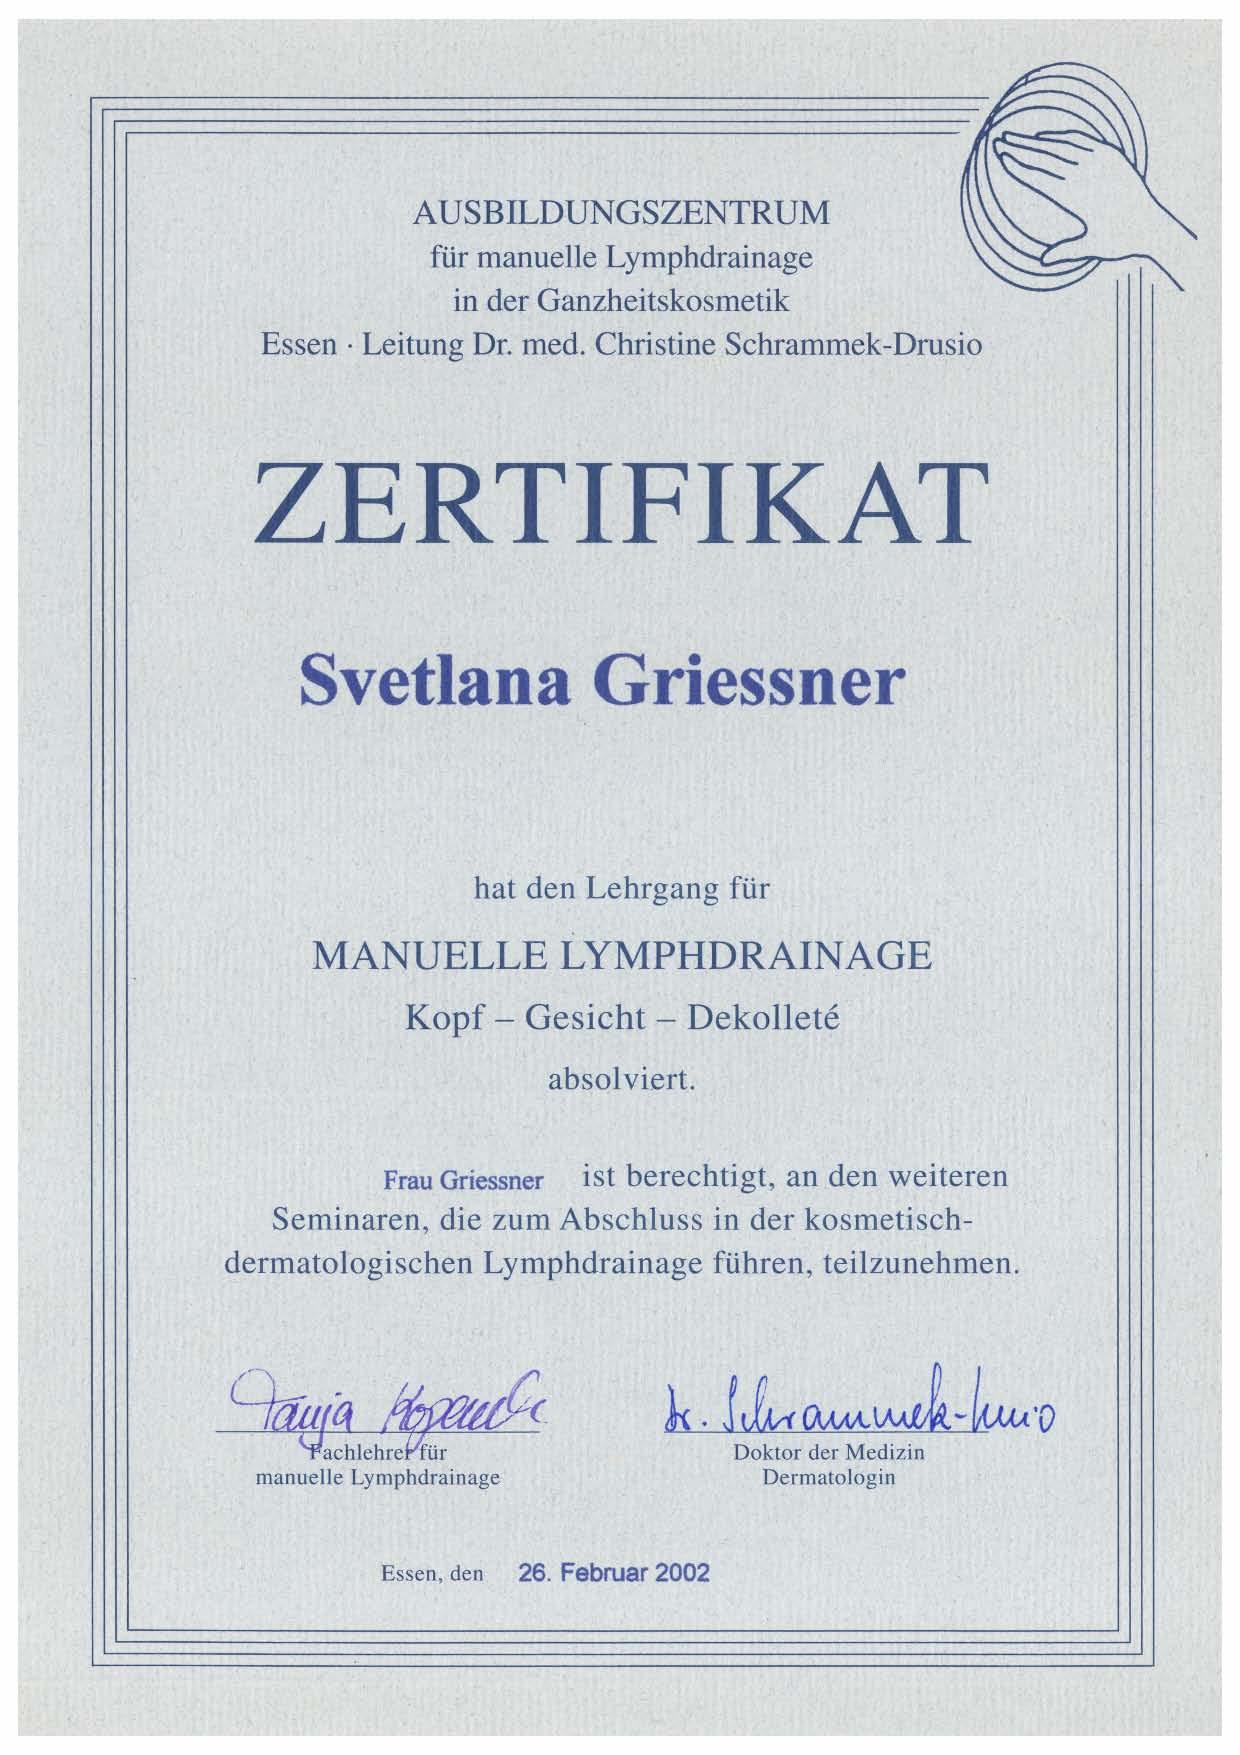 Zertifikat für den Lehrgang der Manuellen Lymphdrainage